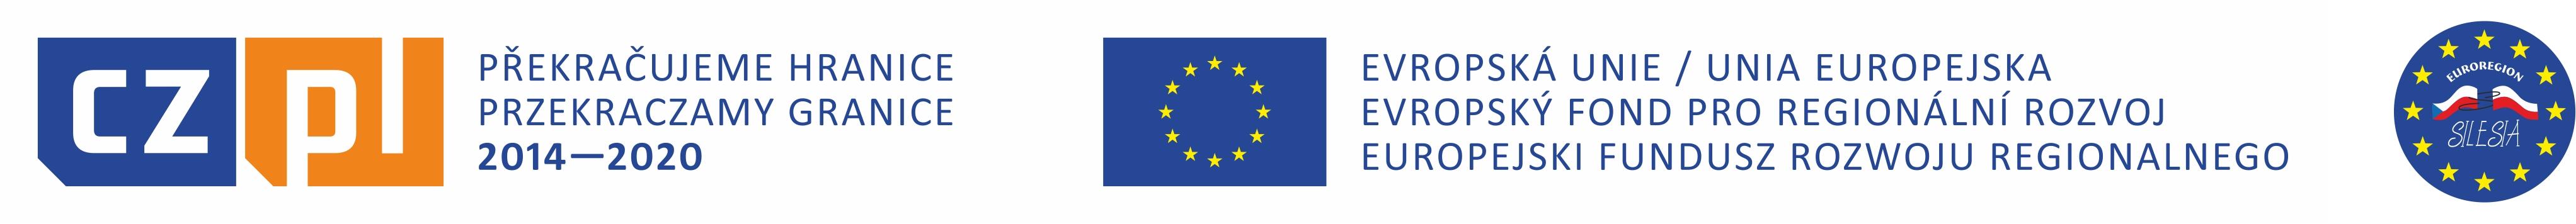 logo_cz_pl_eu_ersjpg [4089x356]